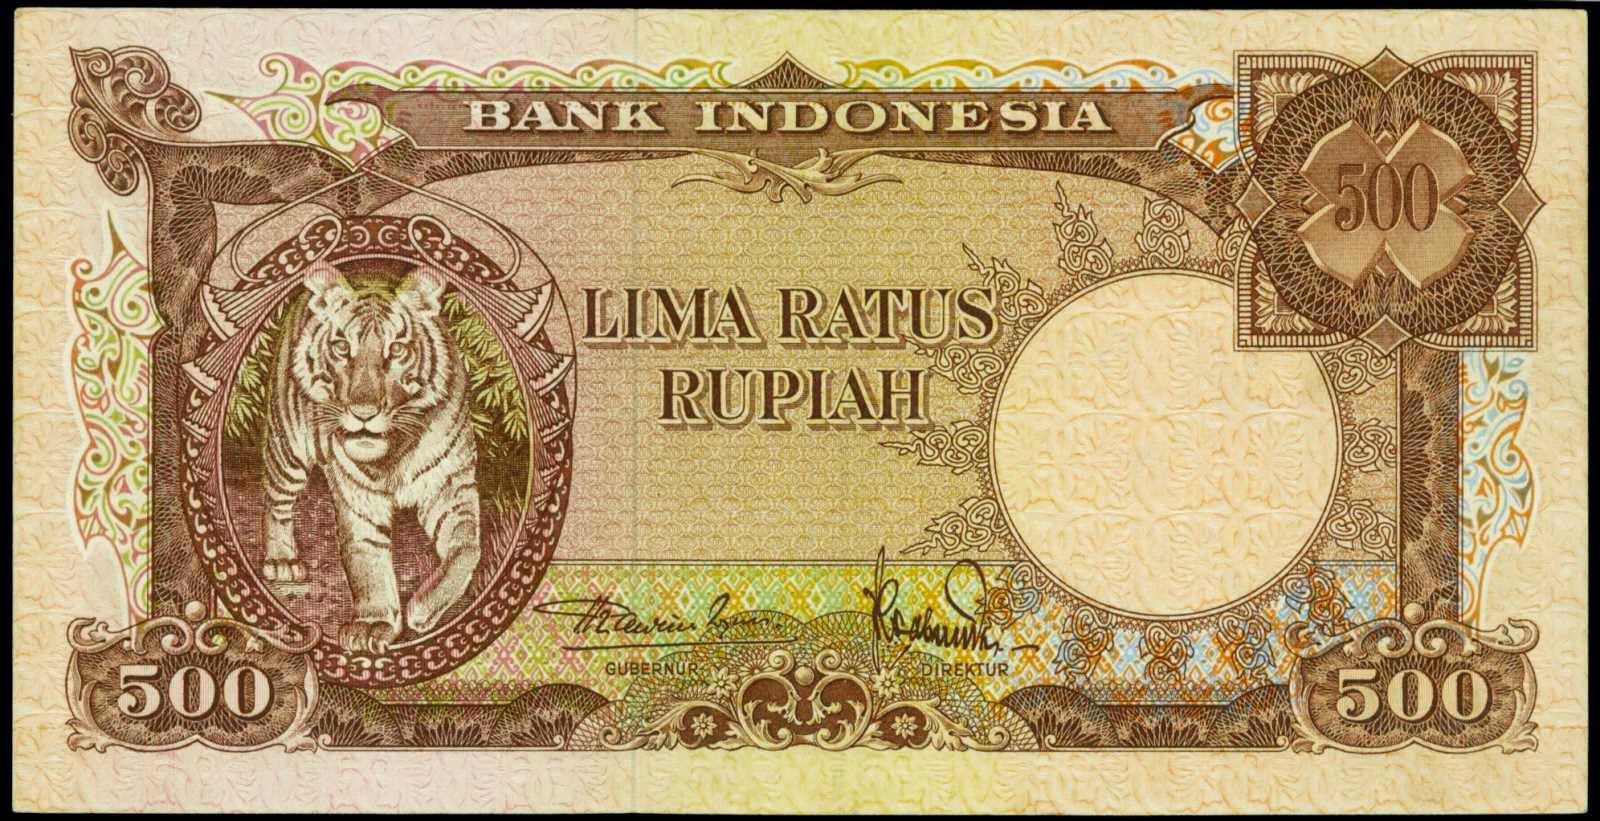 Indonesia banknotes 500 Rupiah banknote 1957 Tiger, Animal Series